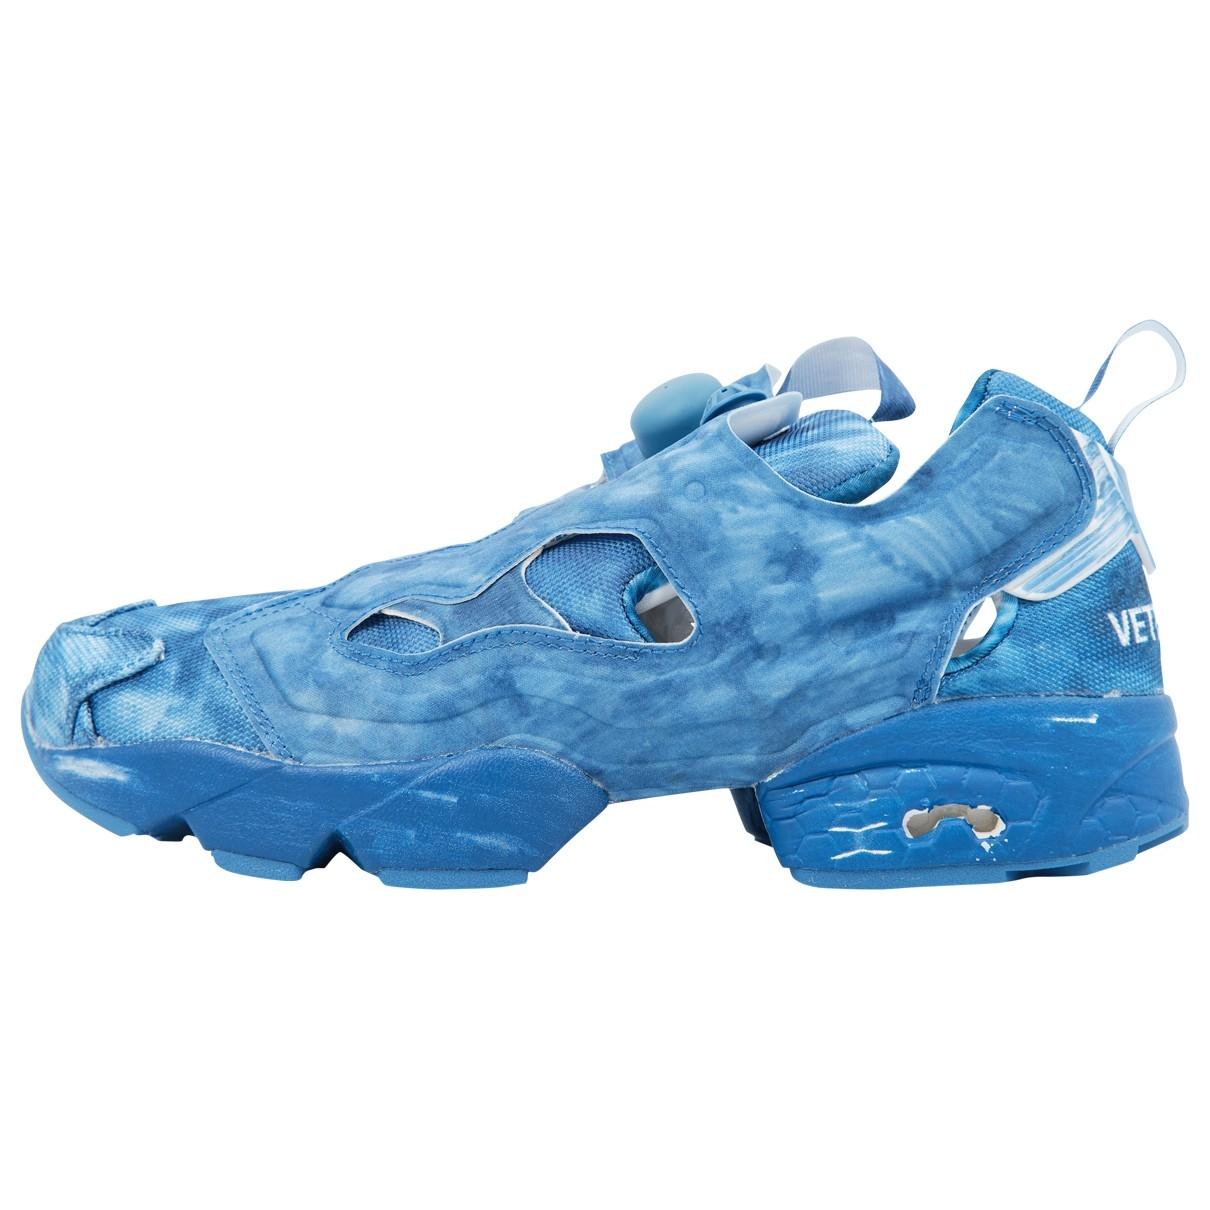 Reebok X Vetements - Baskets   pour femme en toile - bleu